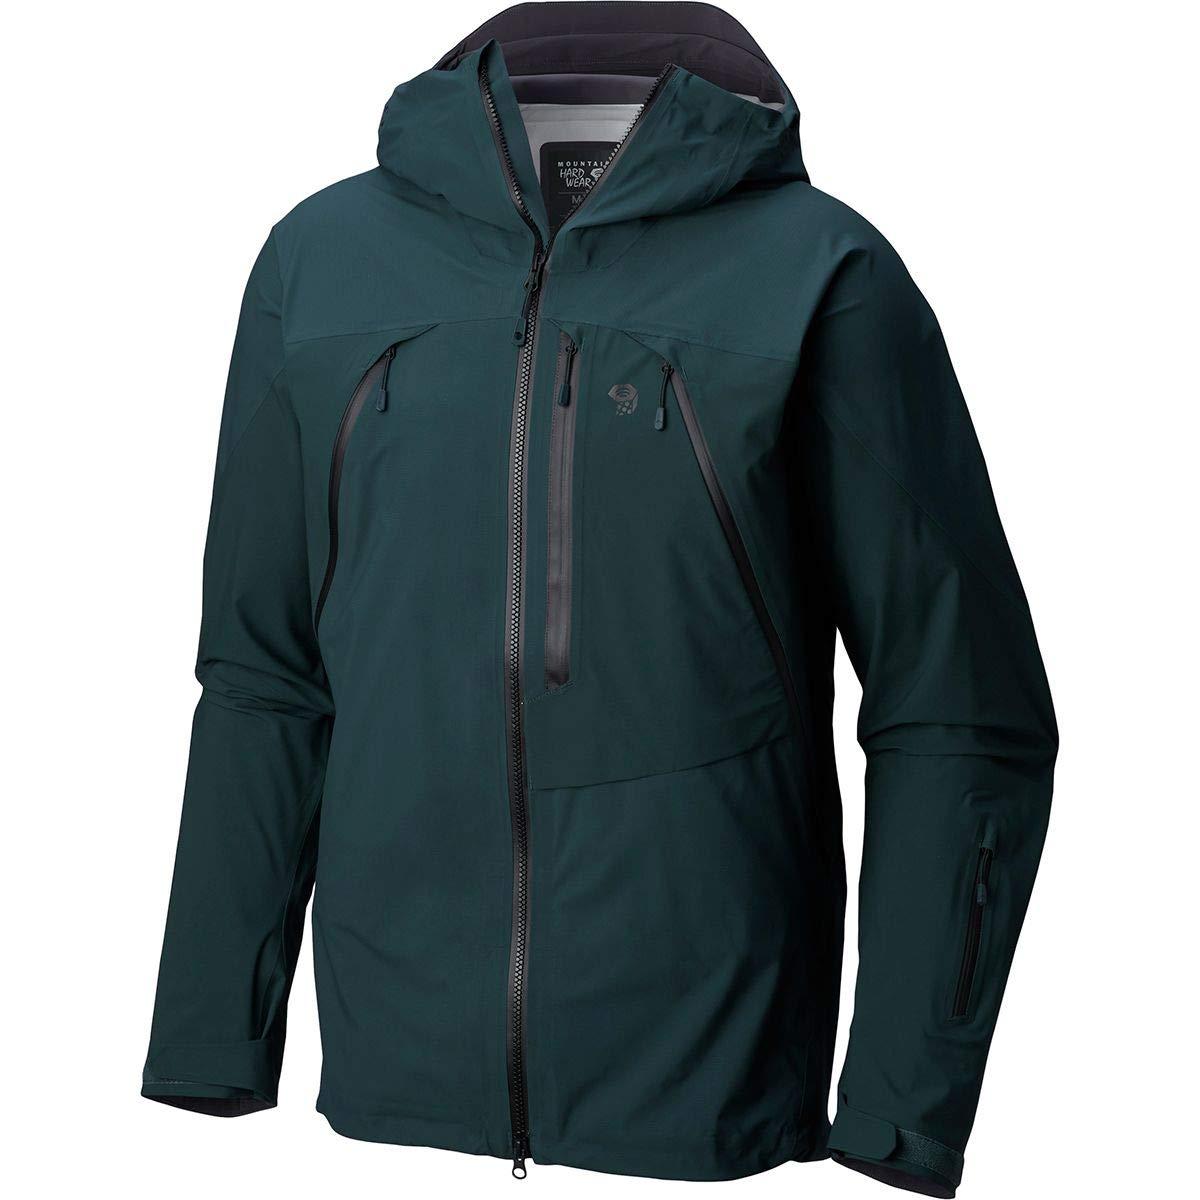 Mountain Hardwear Cloudseeker ジャケット メンズ ブルースプルース(青 Spruce) Large